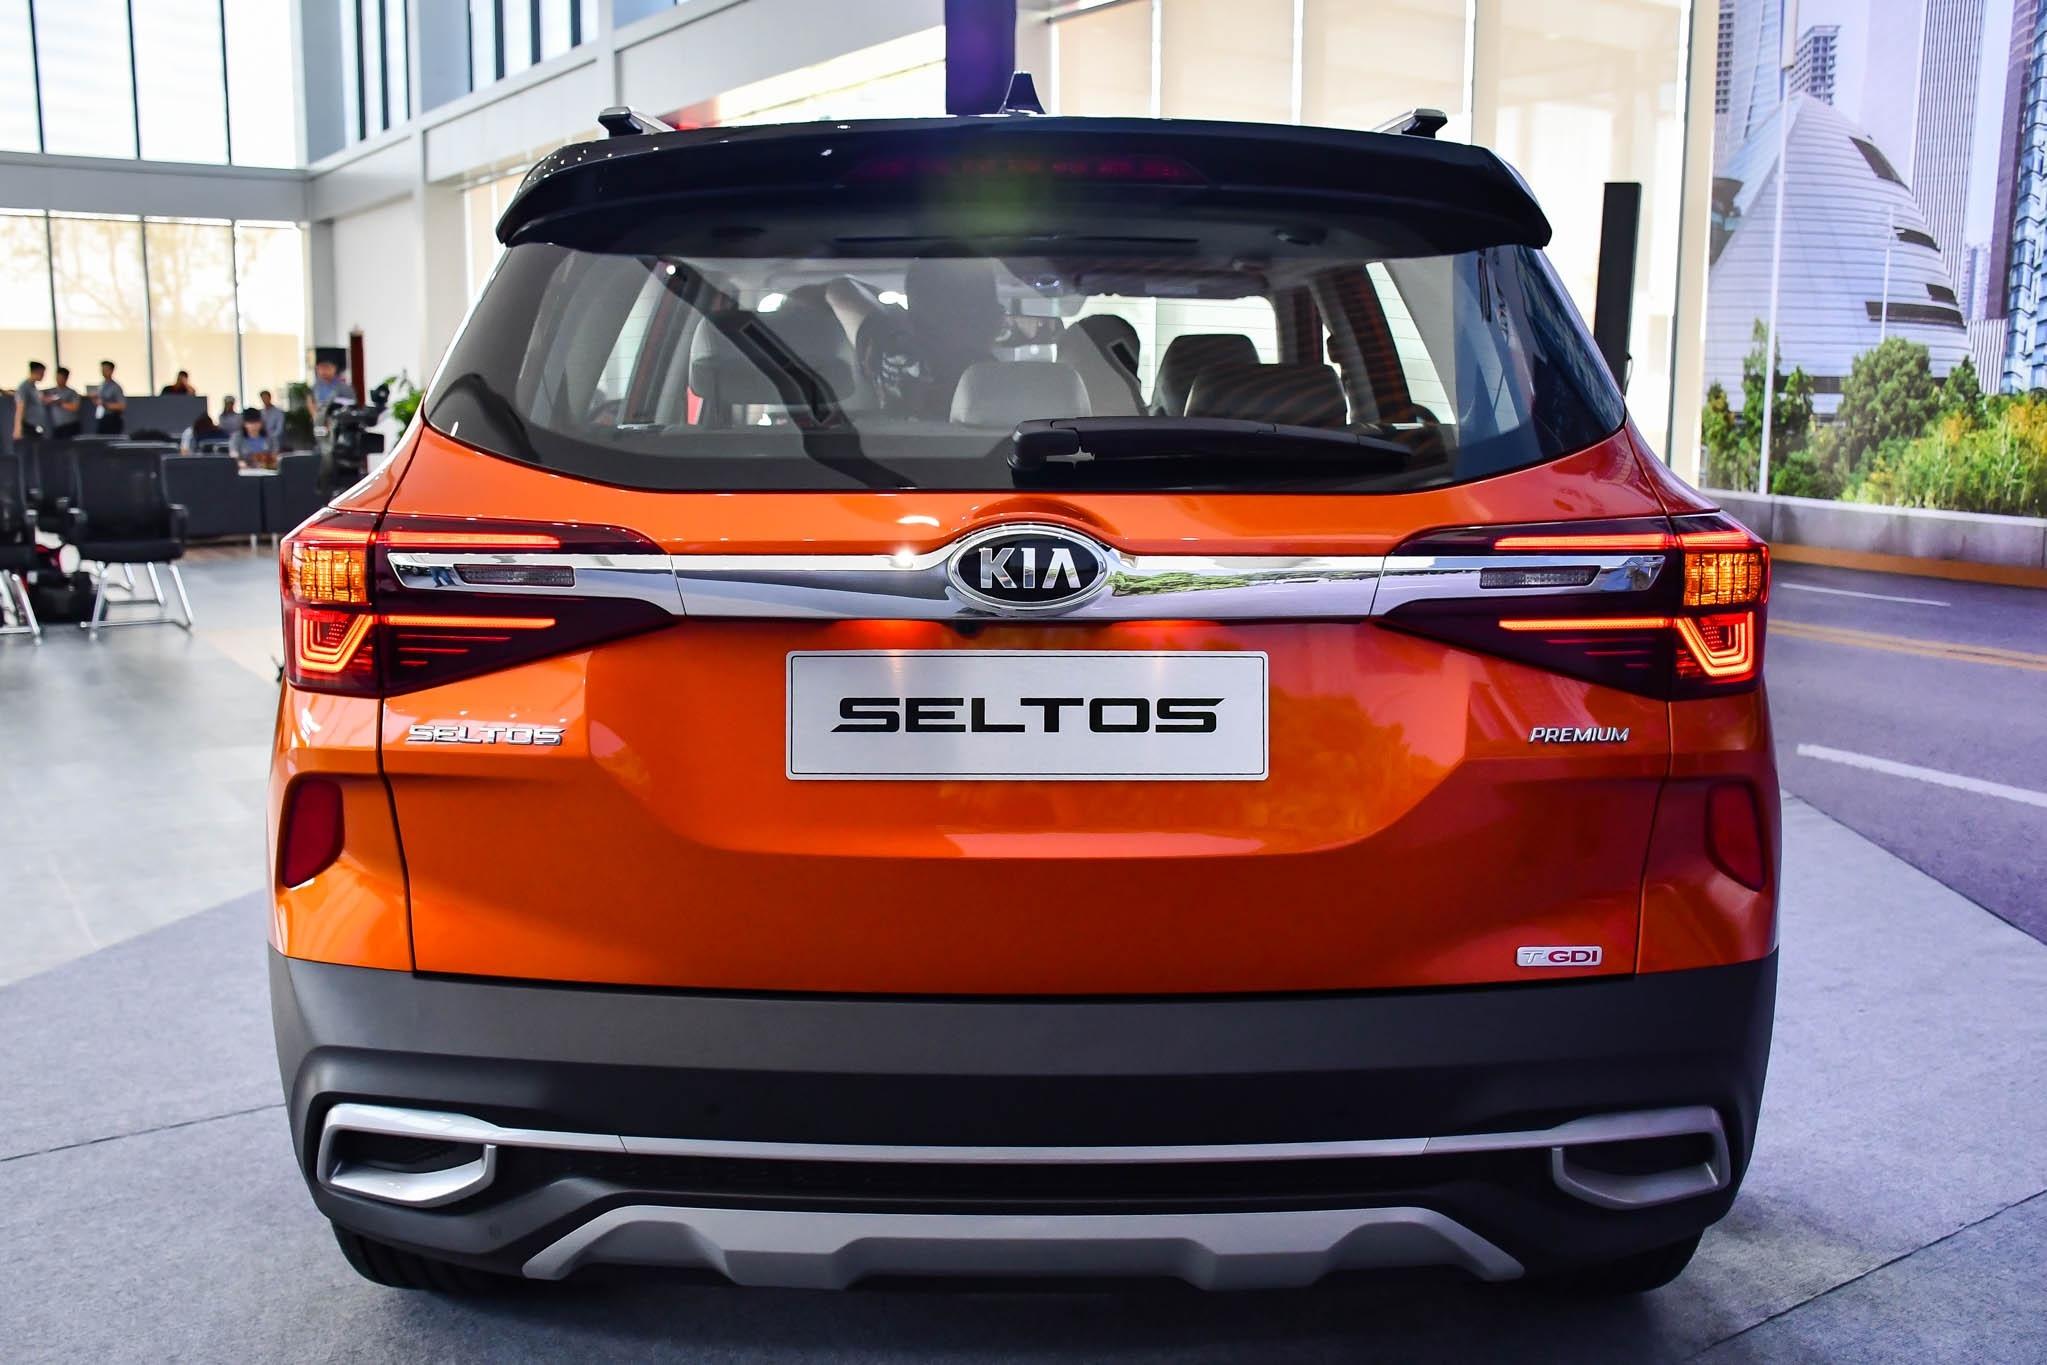 Chon Kia Seltos 1.4 Premium hay Toyota Corolla Cross 1.8V? anh 8